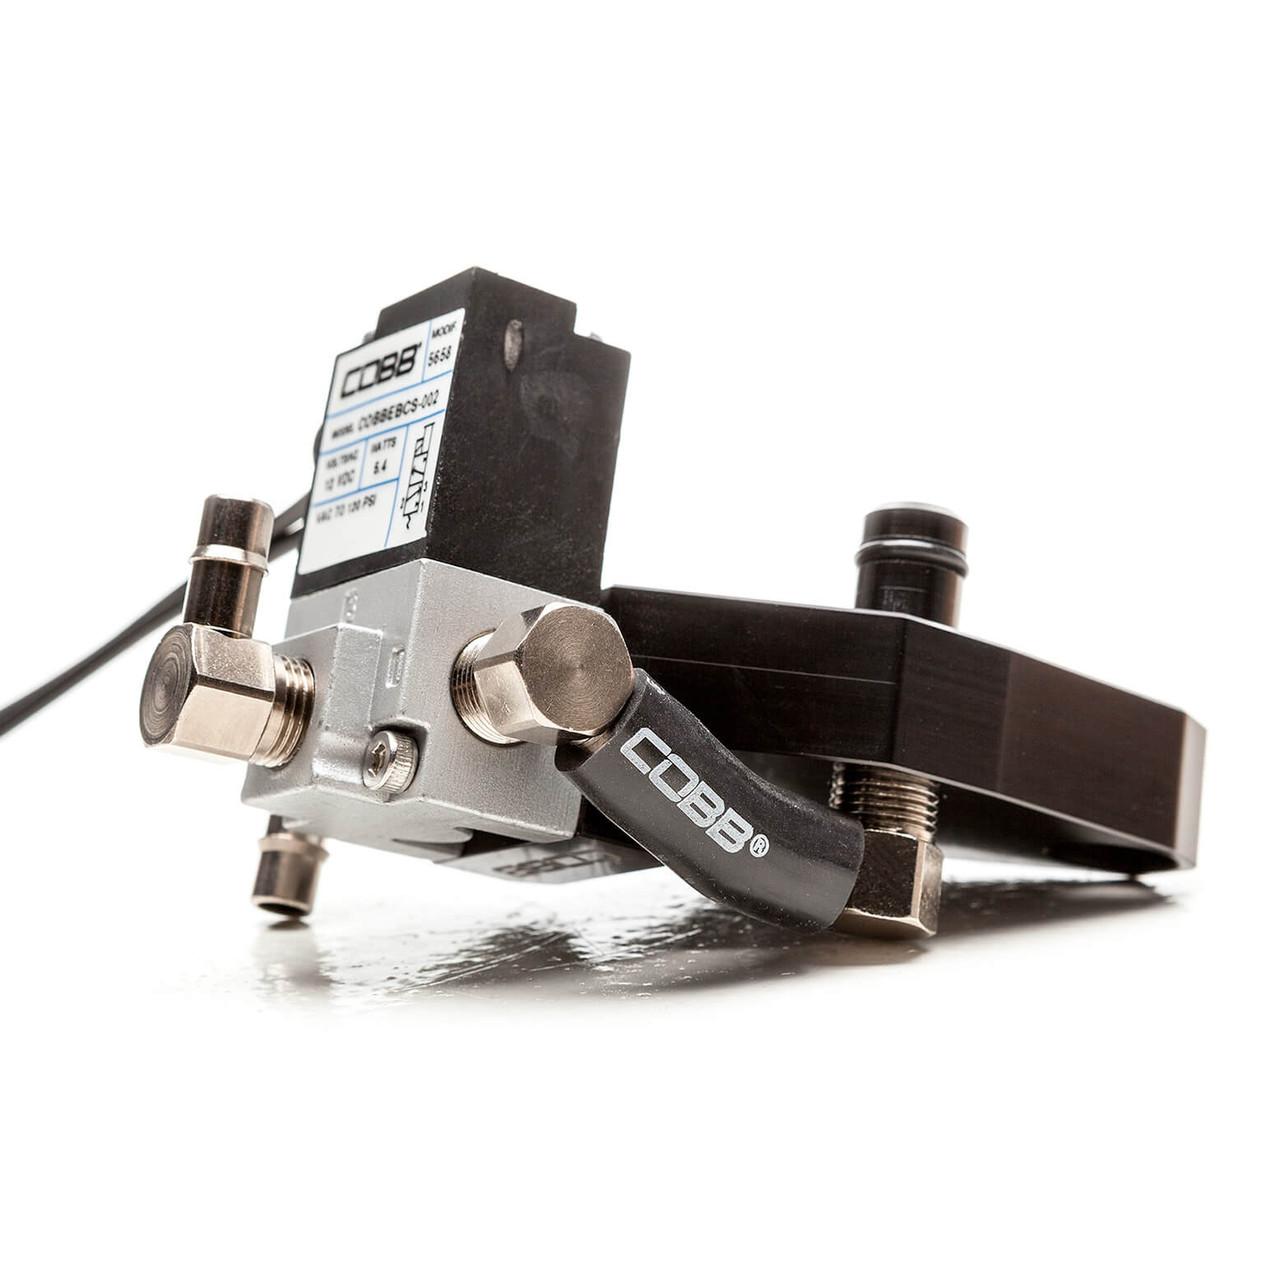 Cobb 3-Port Boost Control Solenoid For 15-20 Subaru WRX - 714750